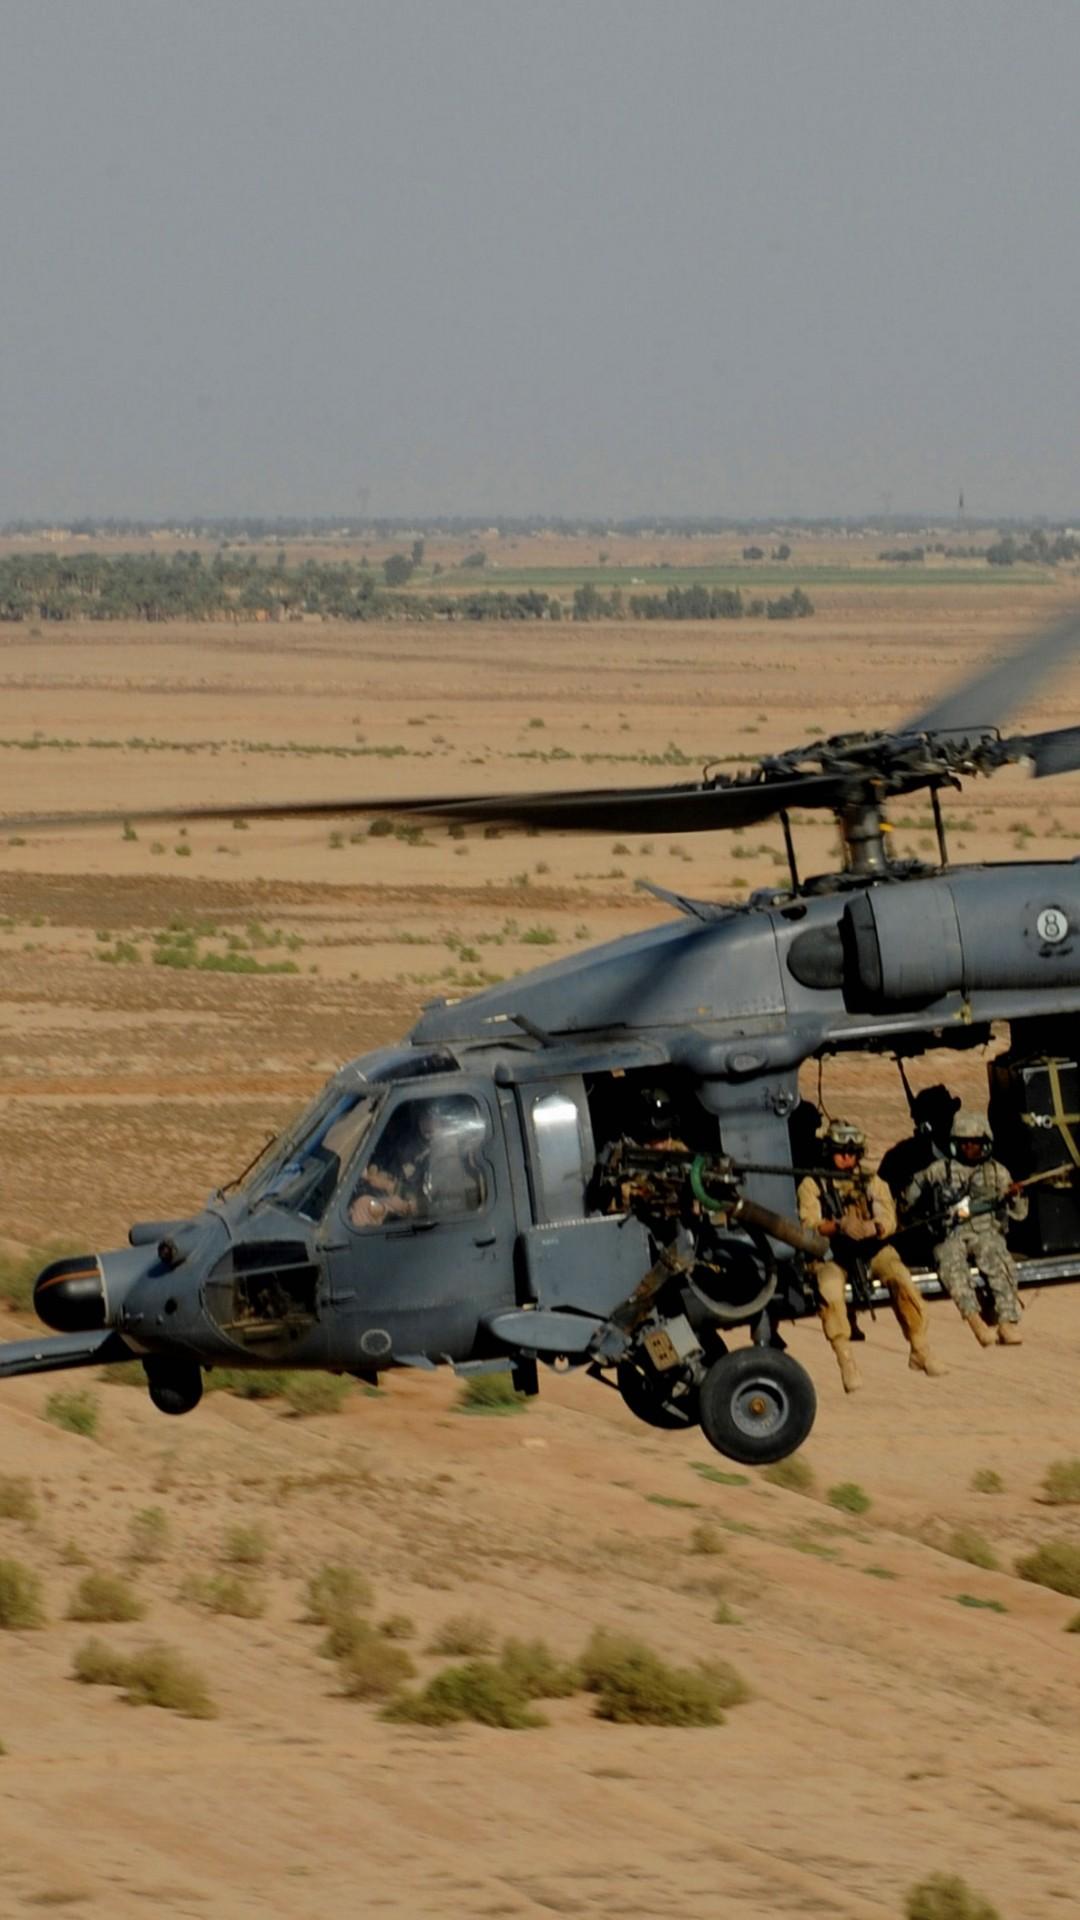 Wallpaper Sikorsky UH-60 Black Hawk, helicopter, U.S. Air